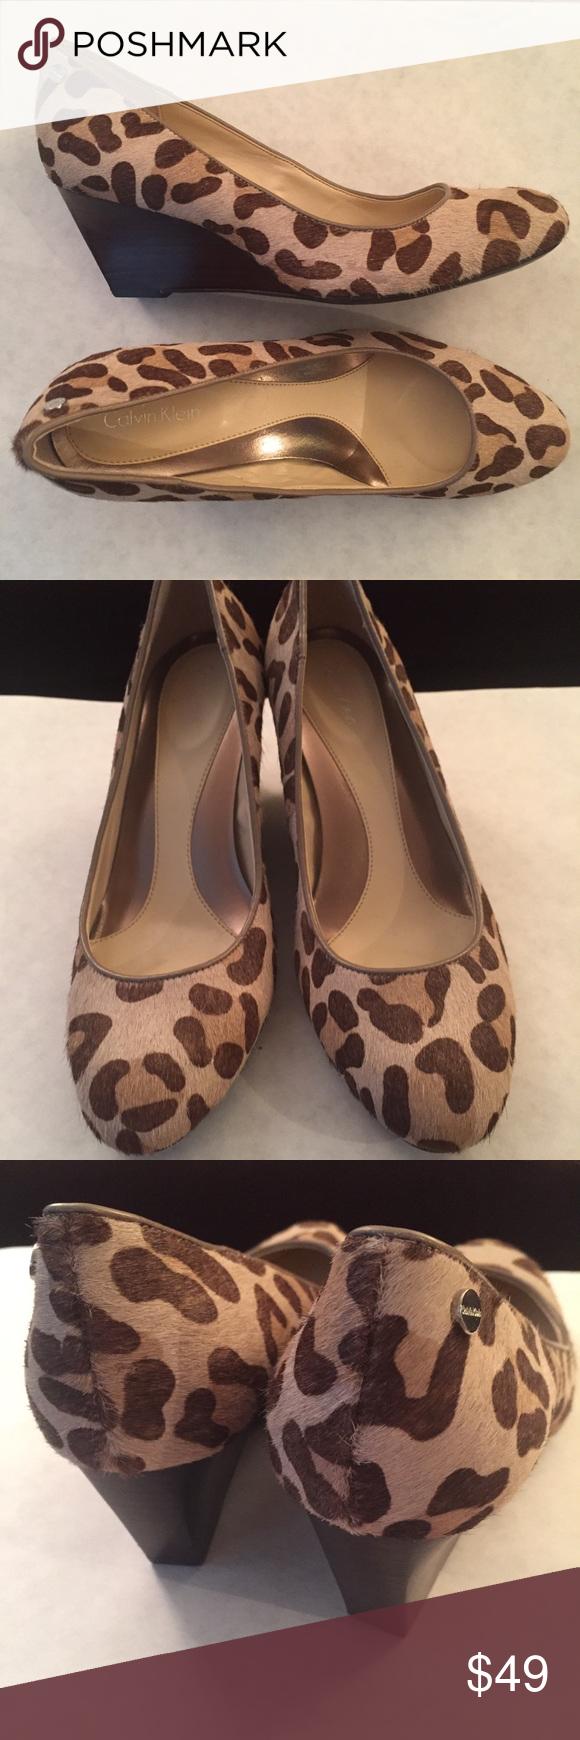 calvin klein animal print shoes